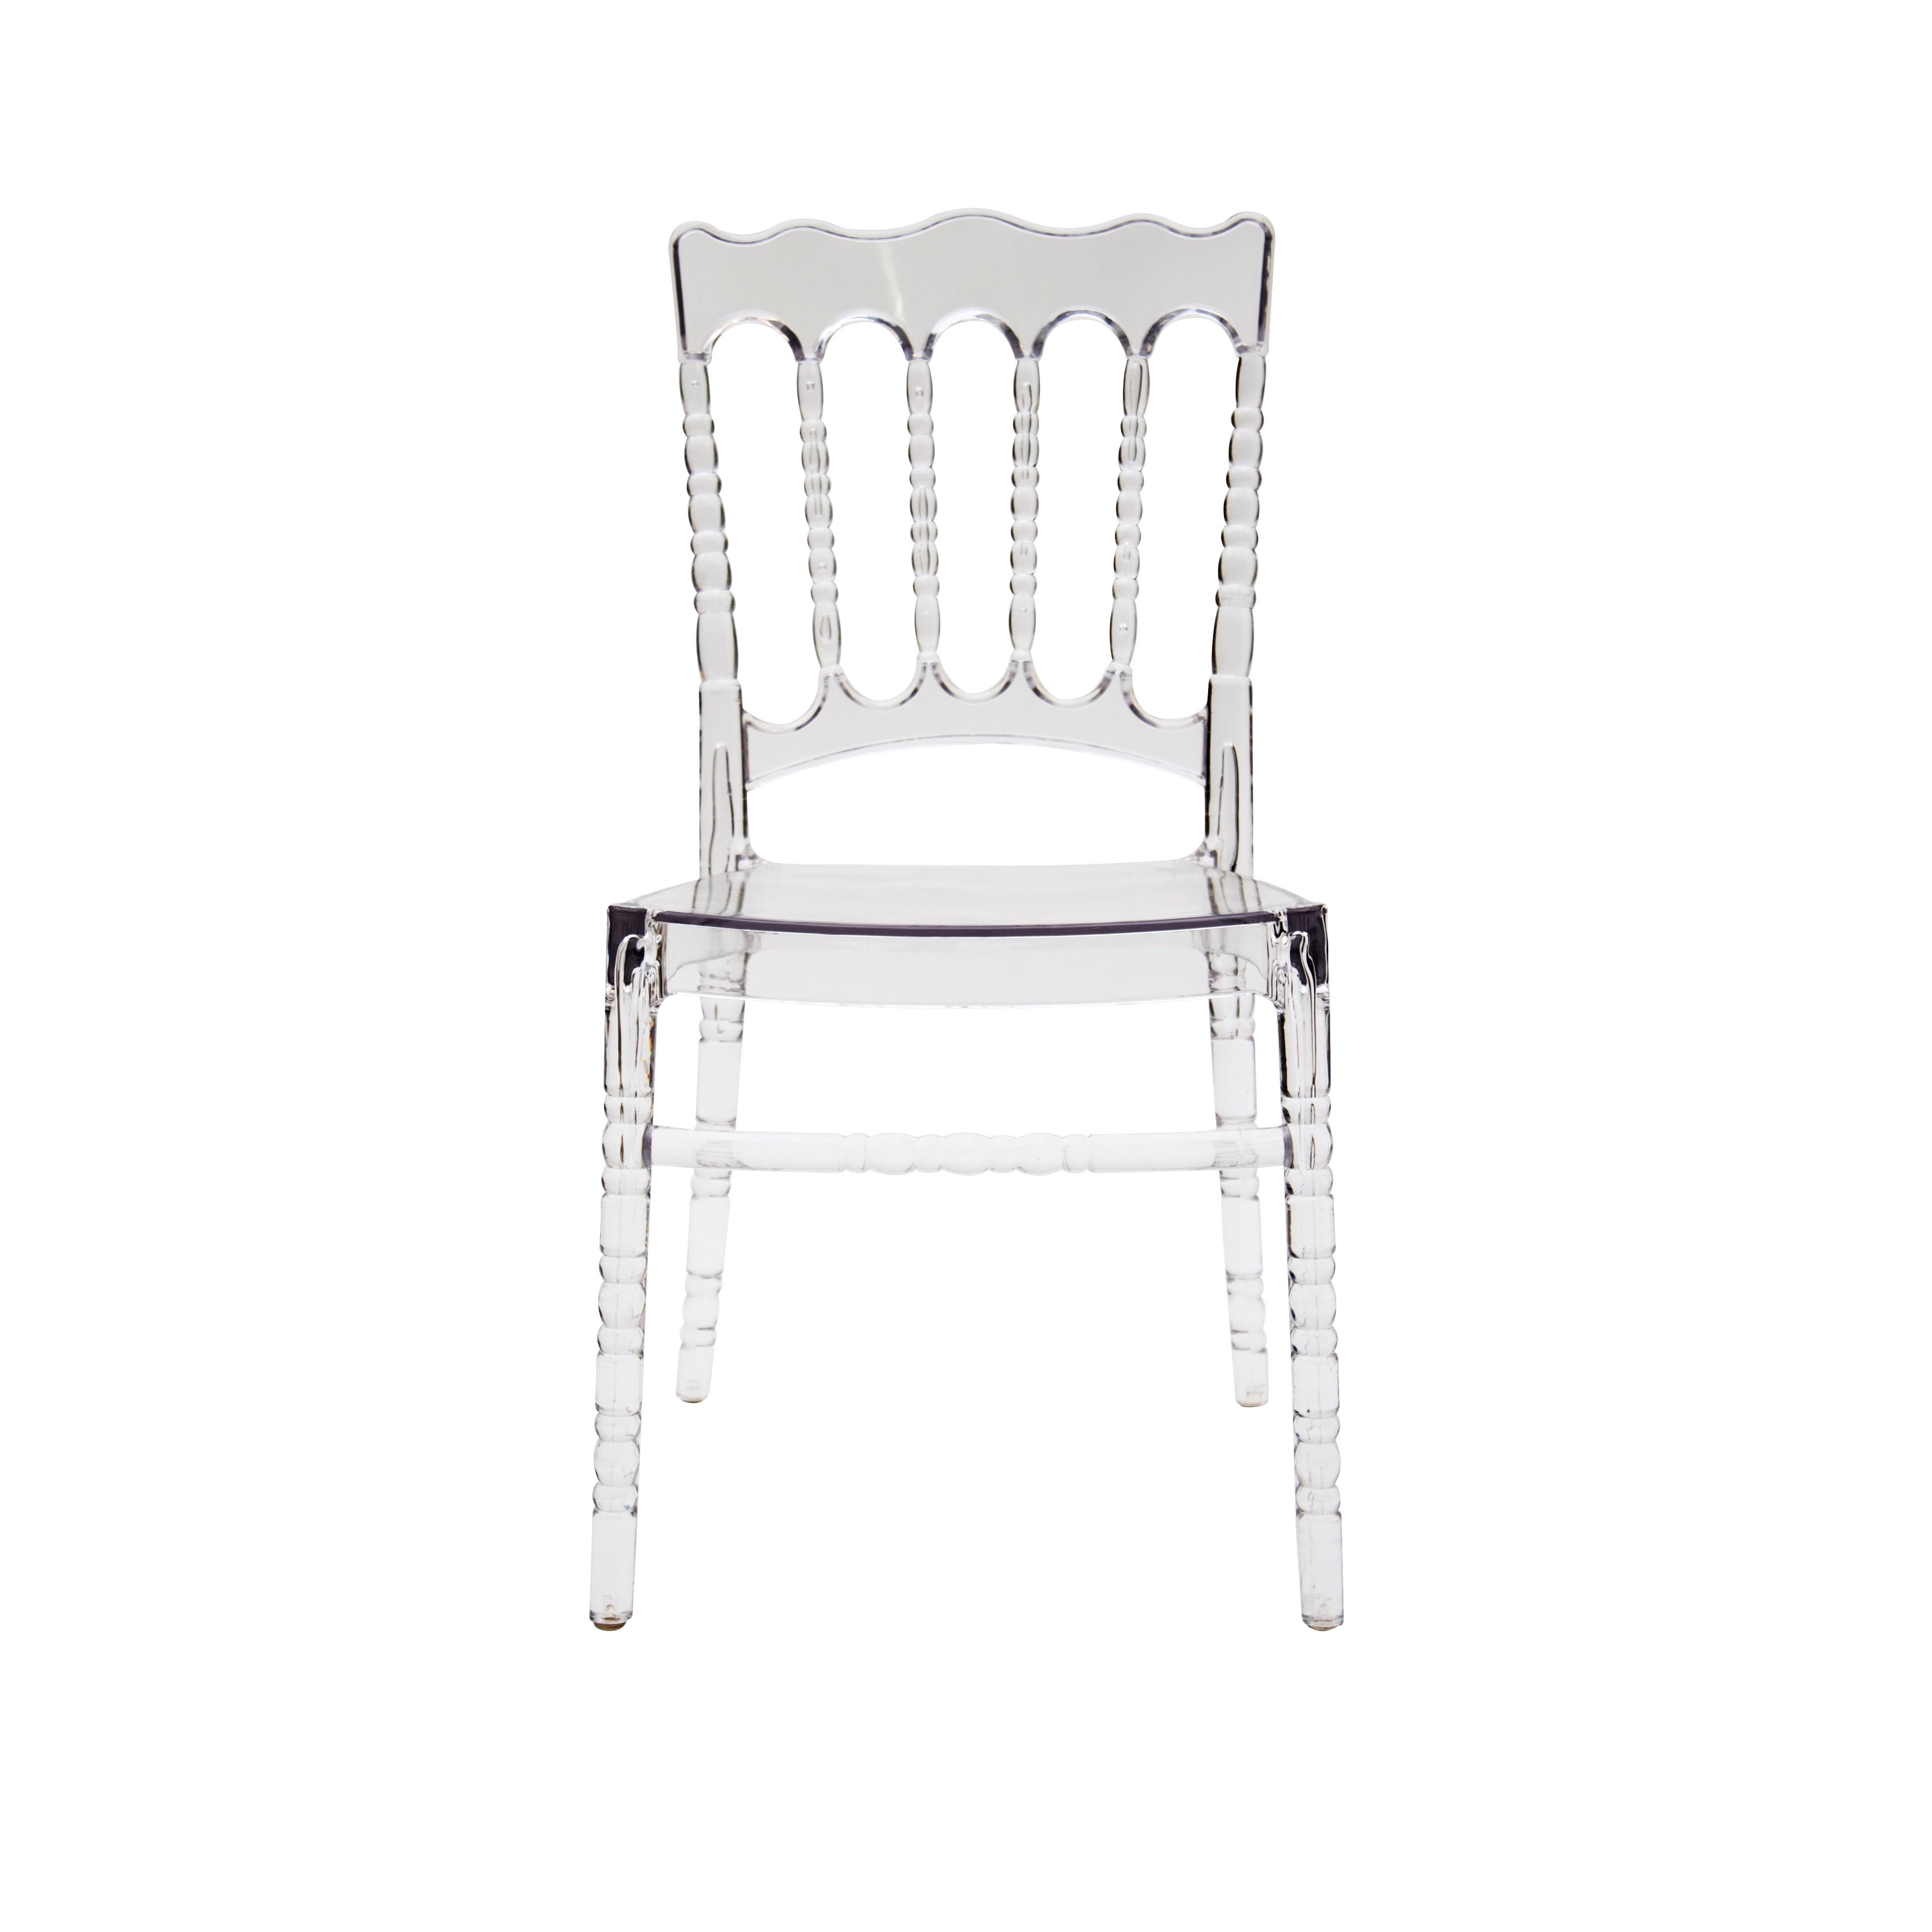 Sedie Trasparenti In Plastica.Sedia In Polipropilene Colore Trasparente 4 Pezzi